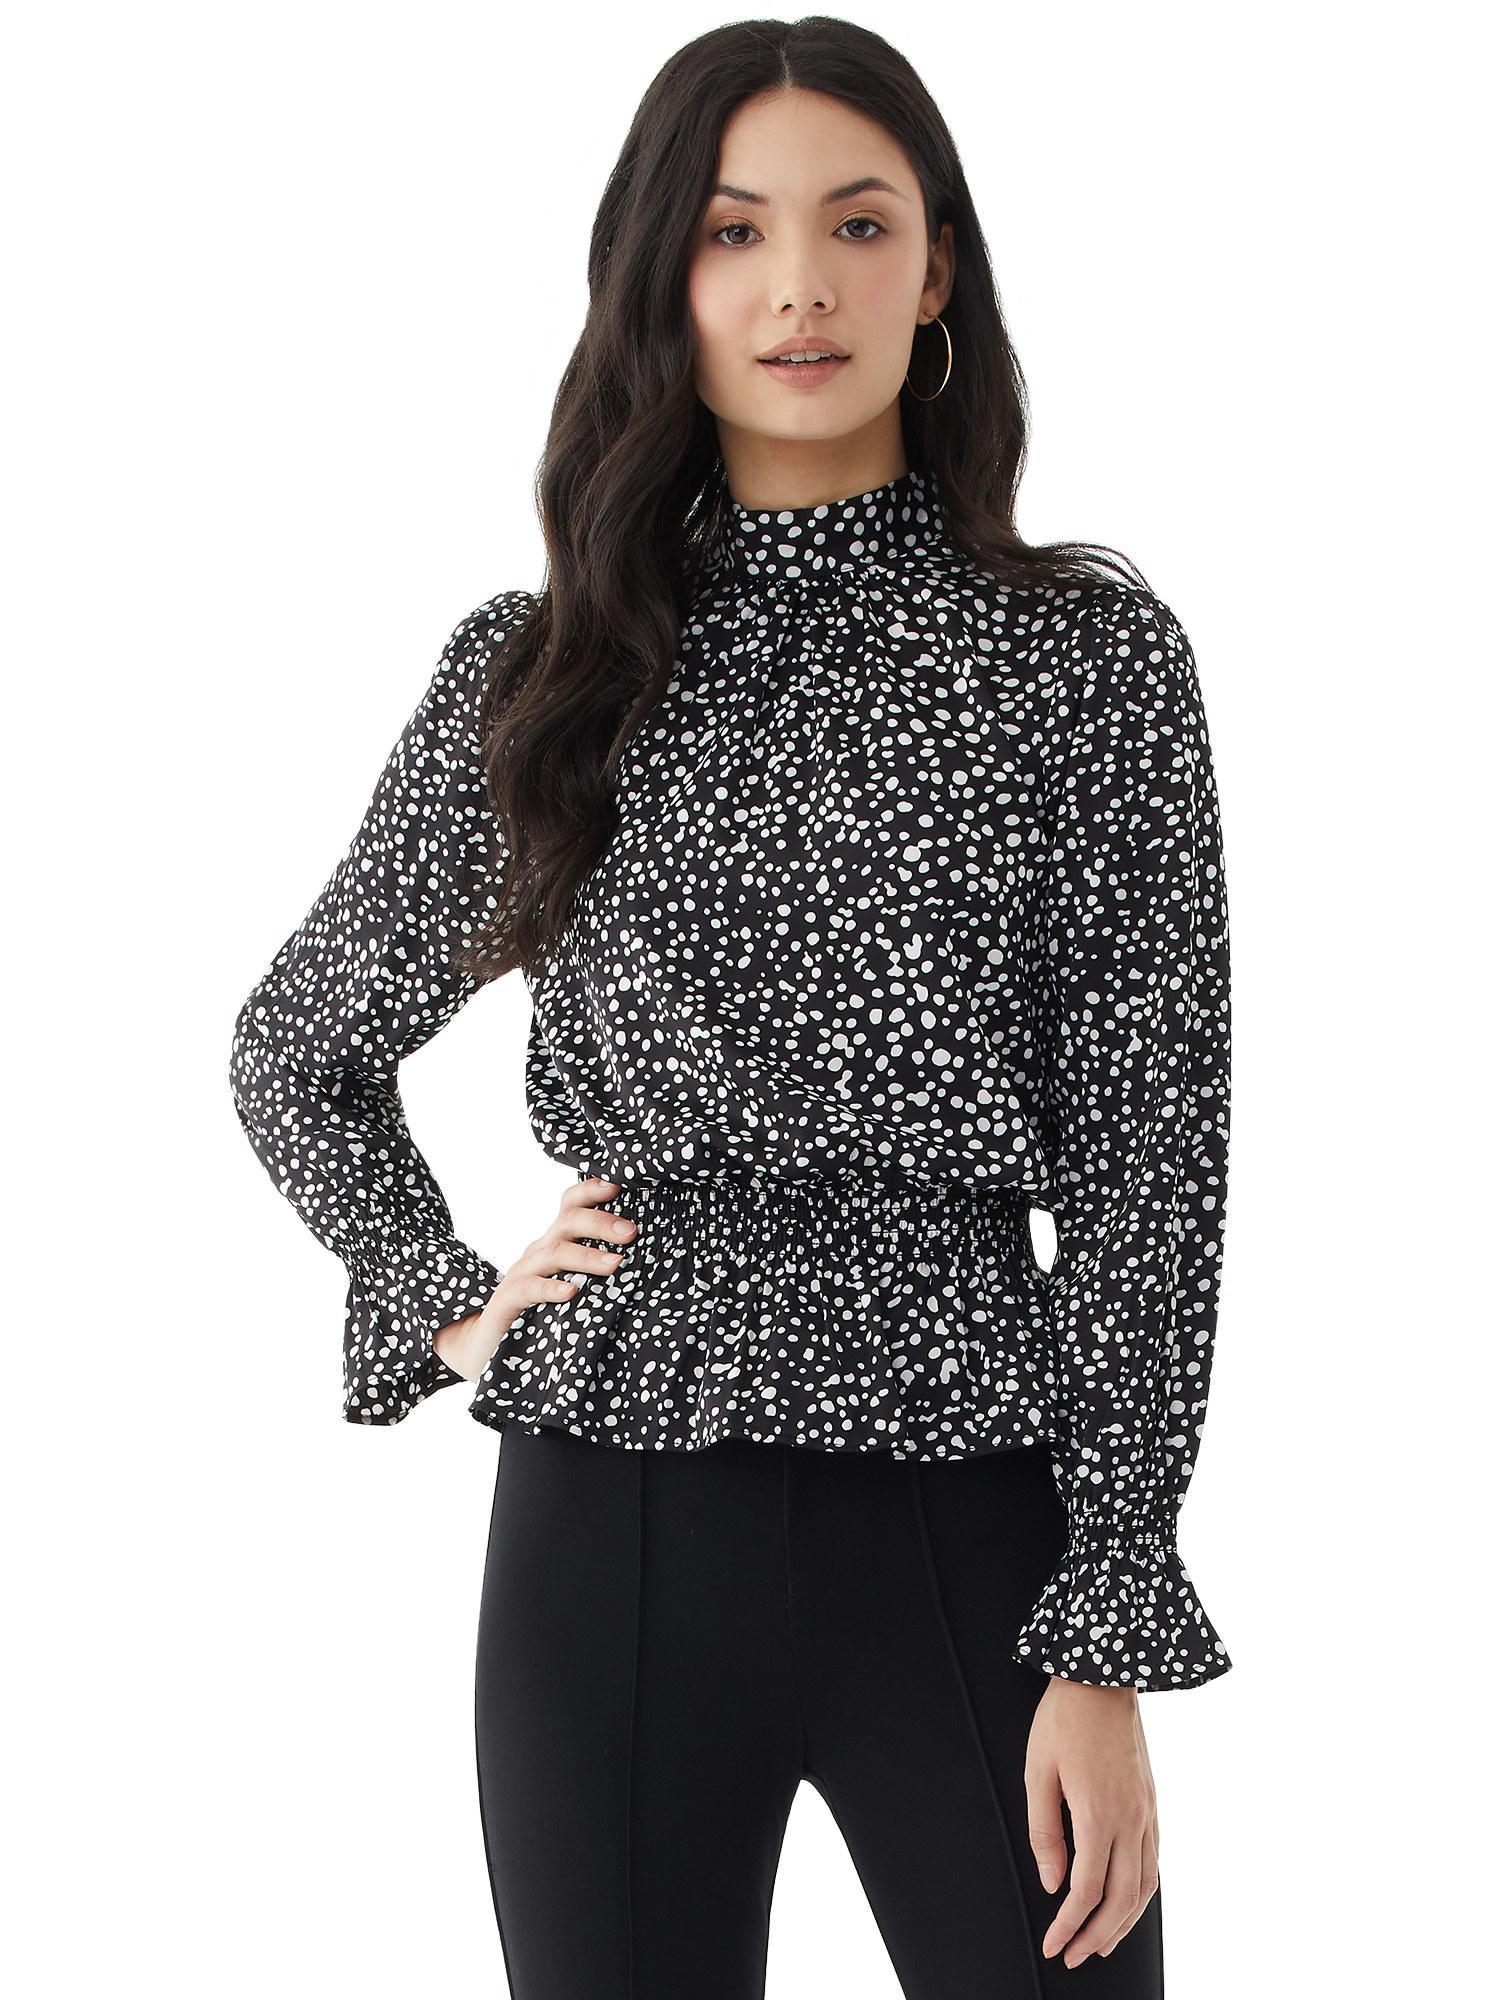 Model wears peplum top in black abstract dot